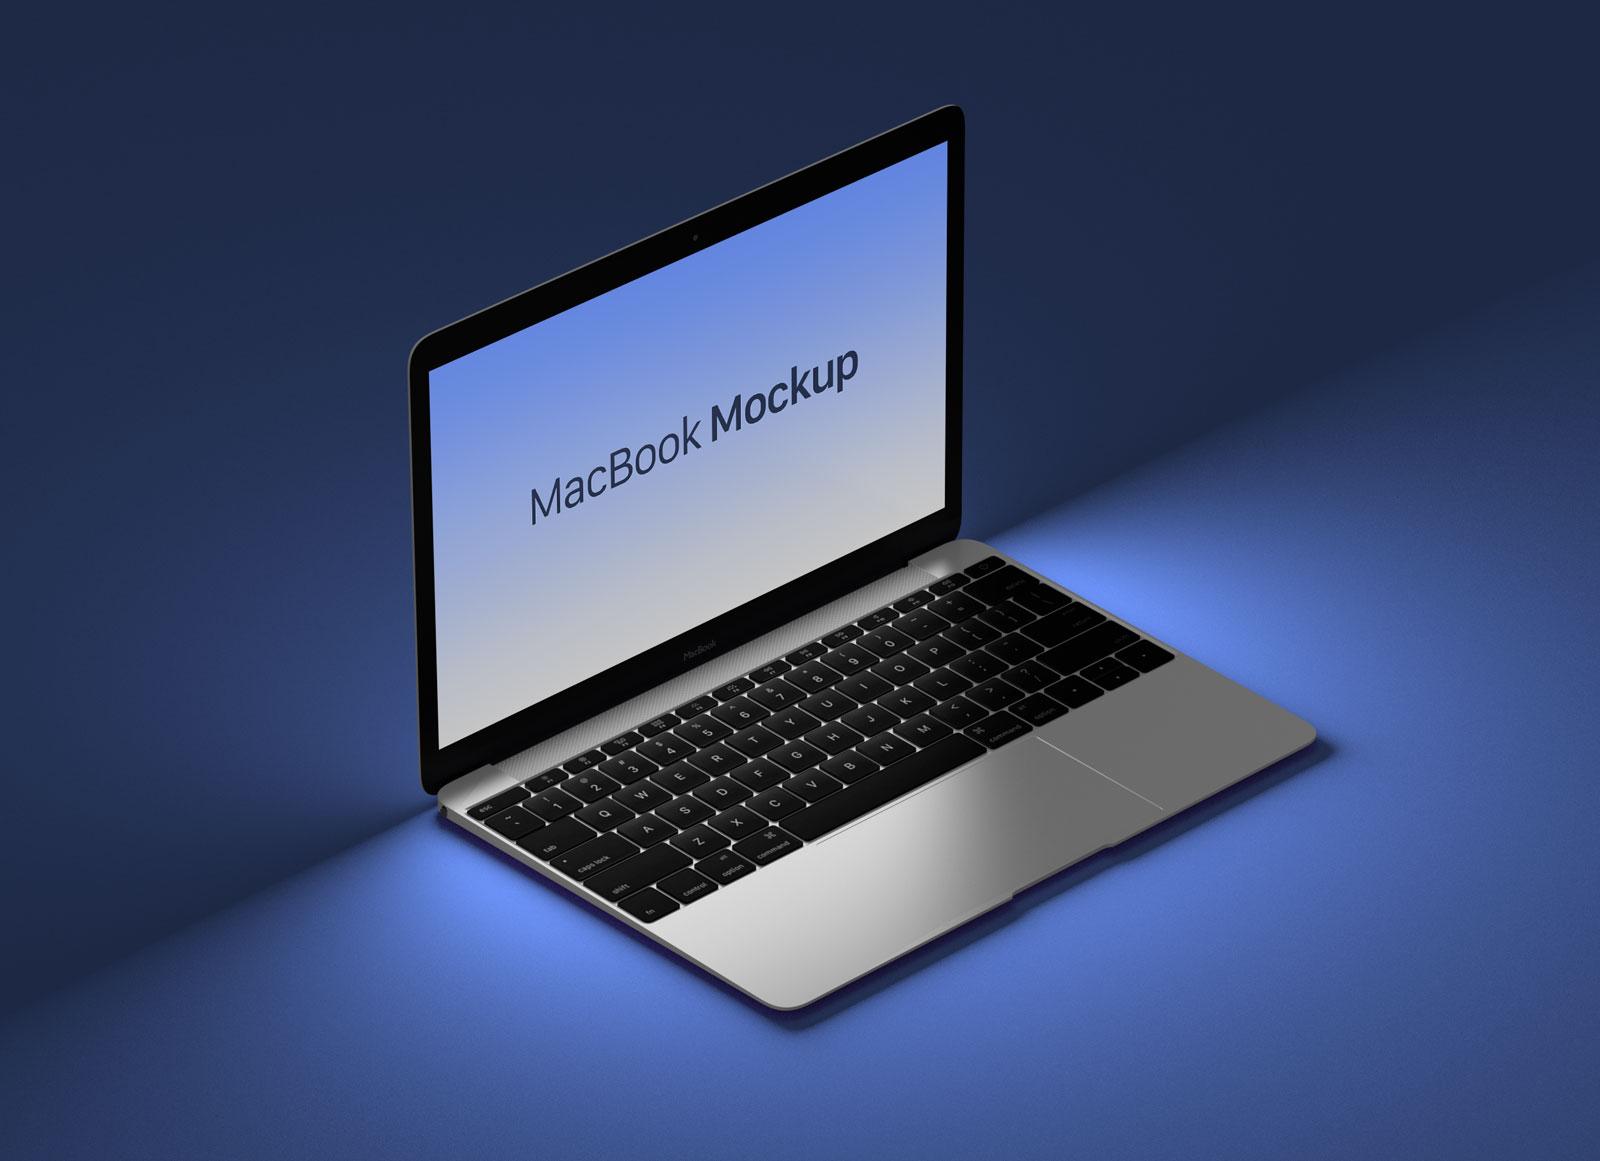 Free-Macbook-Perspective-Mockup-PSD